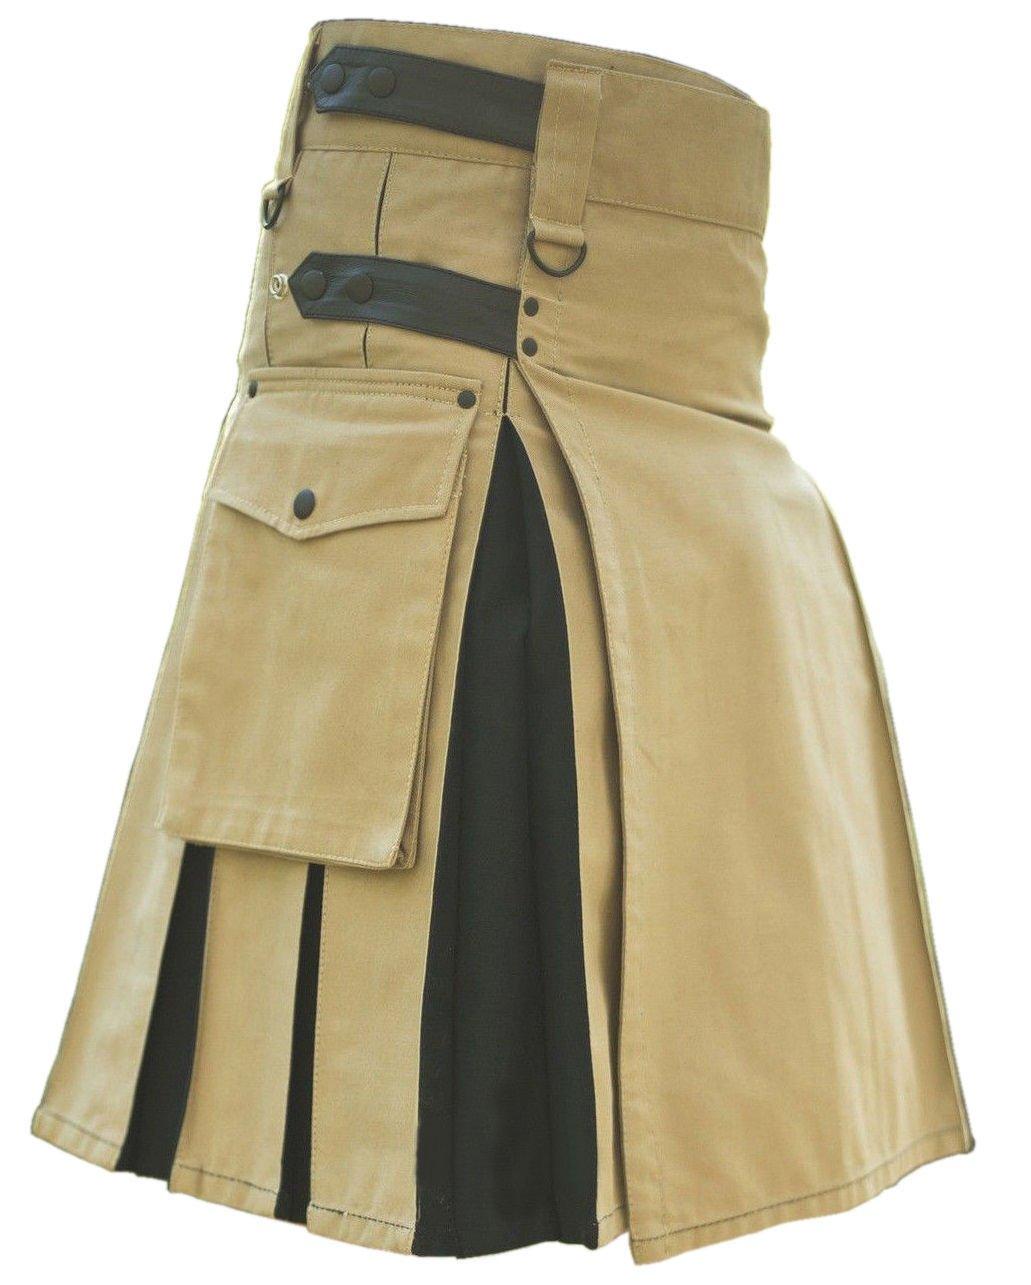 New DC Handmade Black & khaki Cotton Utility Style Hybrid Kilt for Men with Leather straps size 48